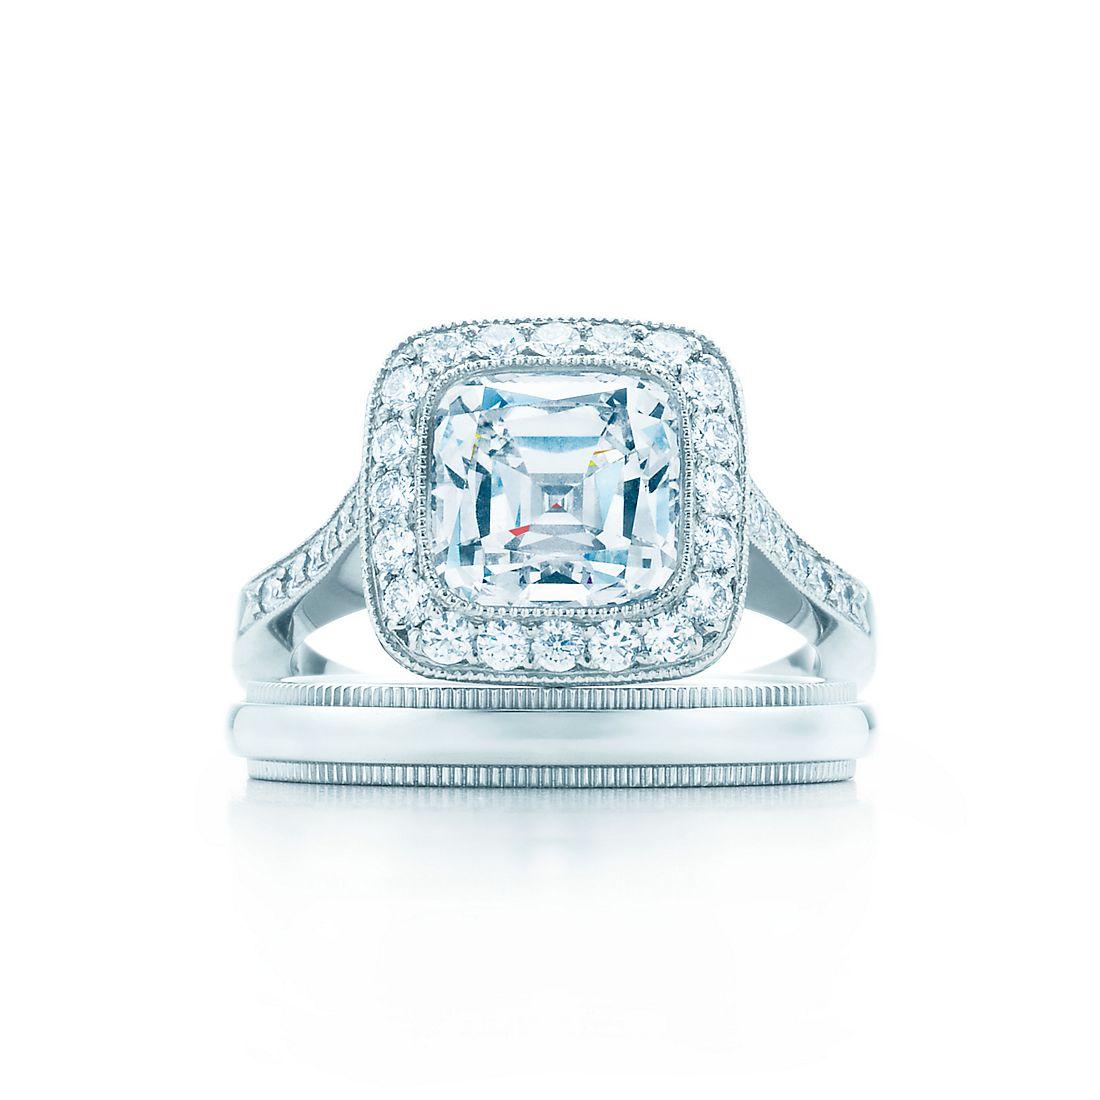 Tiffany Legacy Platinum Diamond Band Engagement Rings Tiffany Co